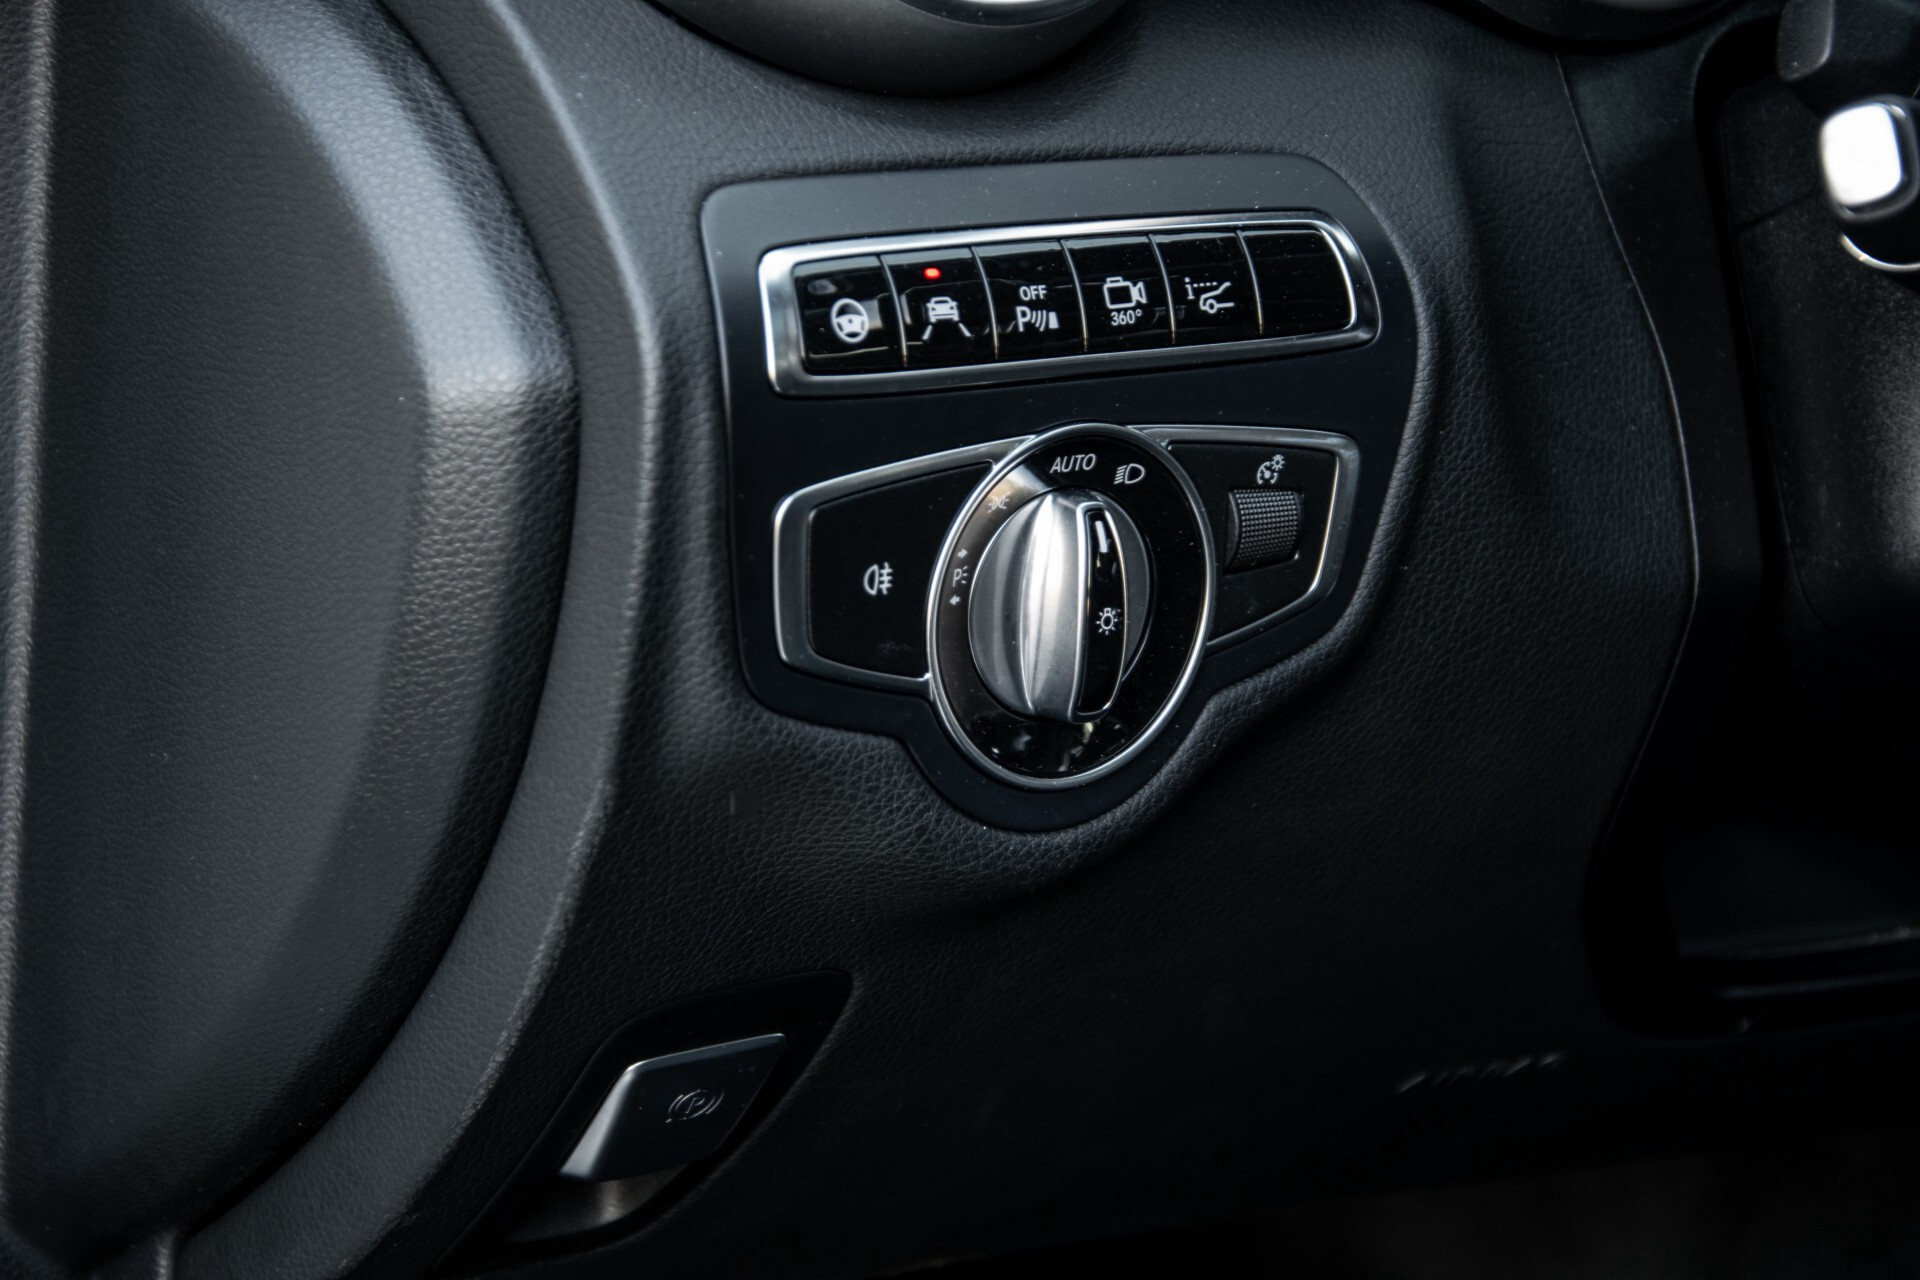 Mercedes-Benz C-Klasse 450/43 AMG 4-M Distronic/Standkachel/Panorama/Keyless/Harman-Kardon/Stoelkoeling Aut7 Foto 37